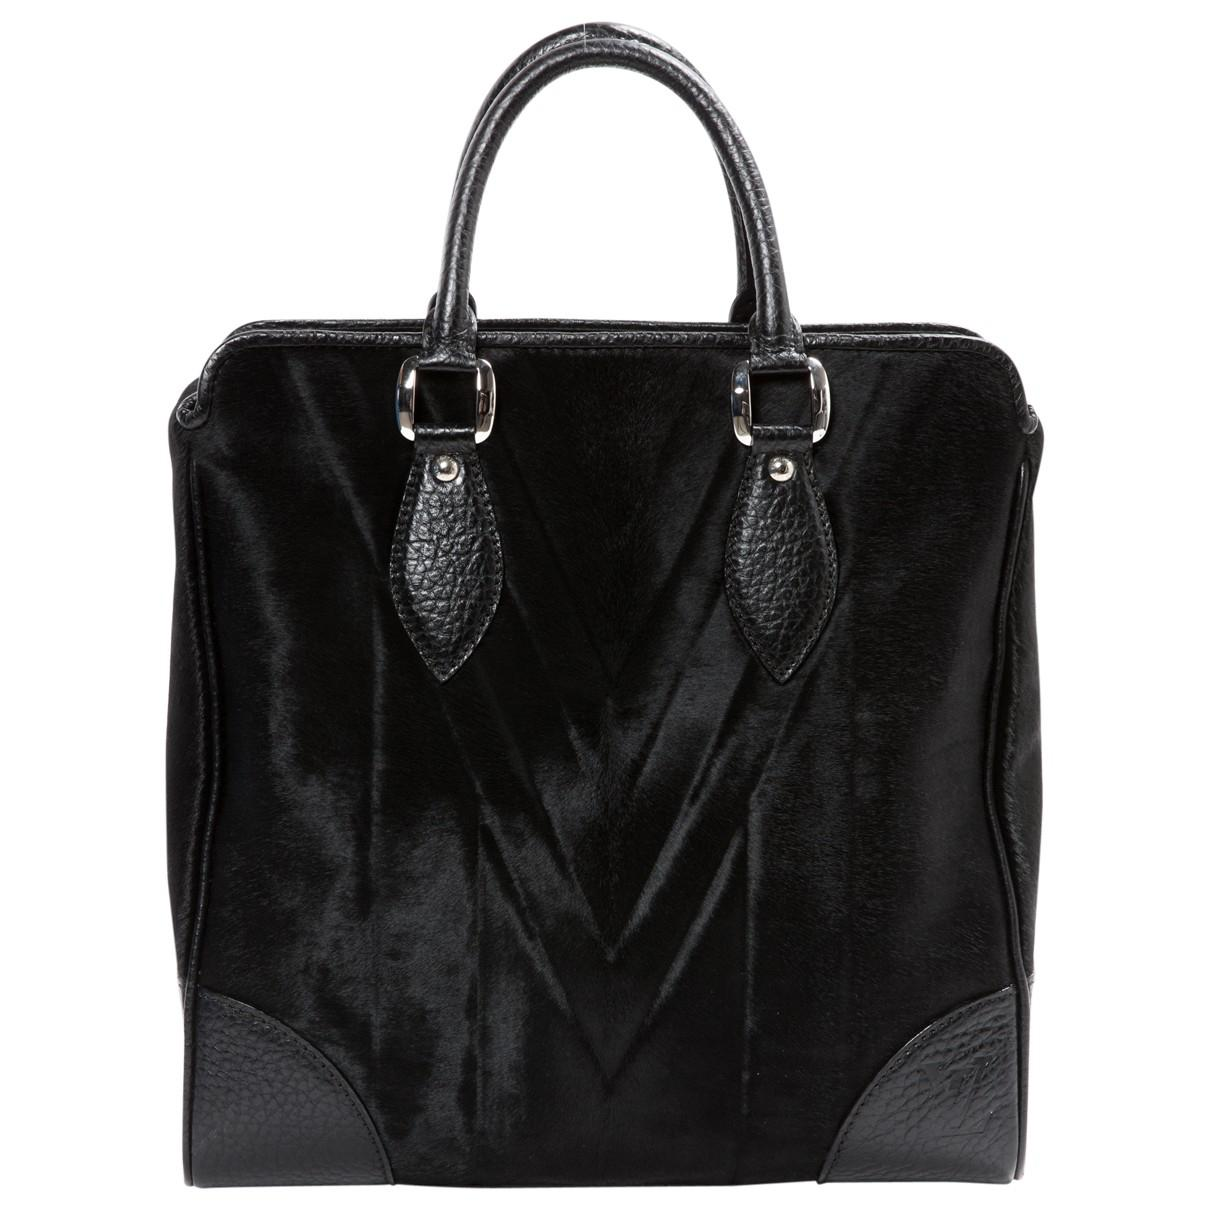 33711b98436c Lyst - Louis Vuitton Pony-style Calfskin Handbag in Black